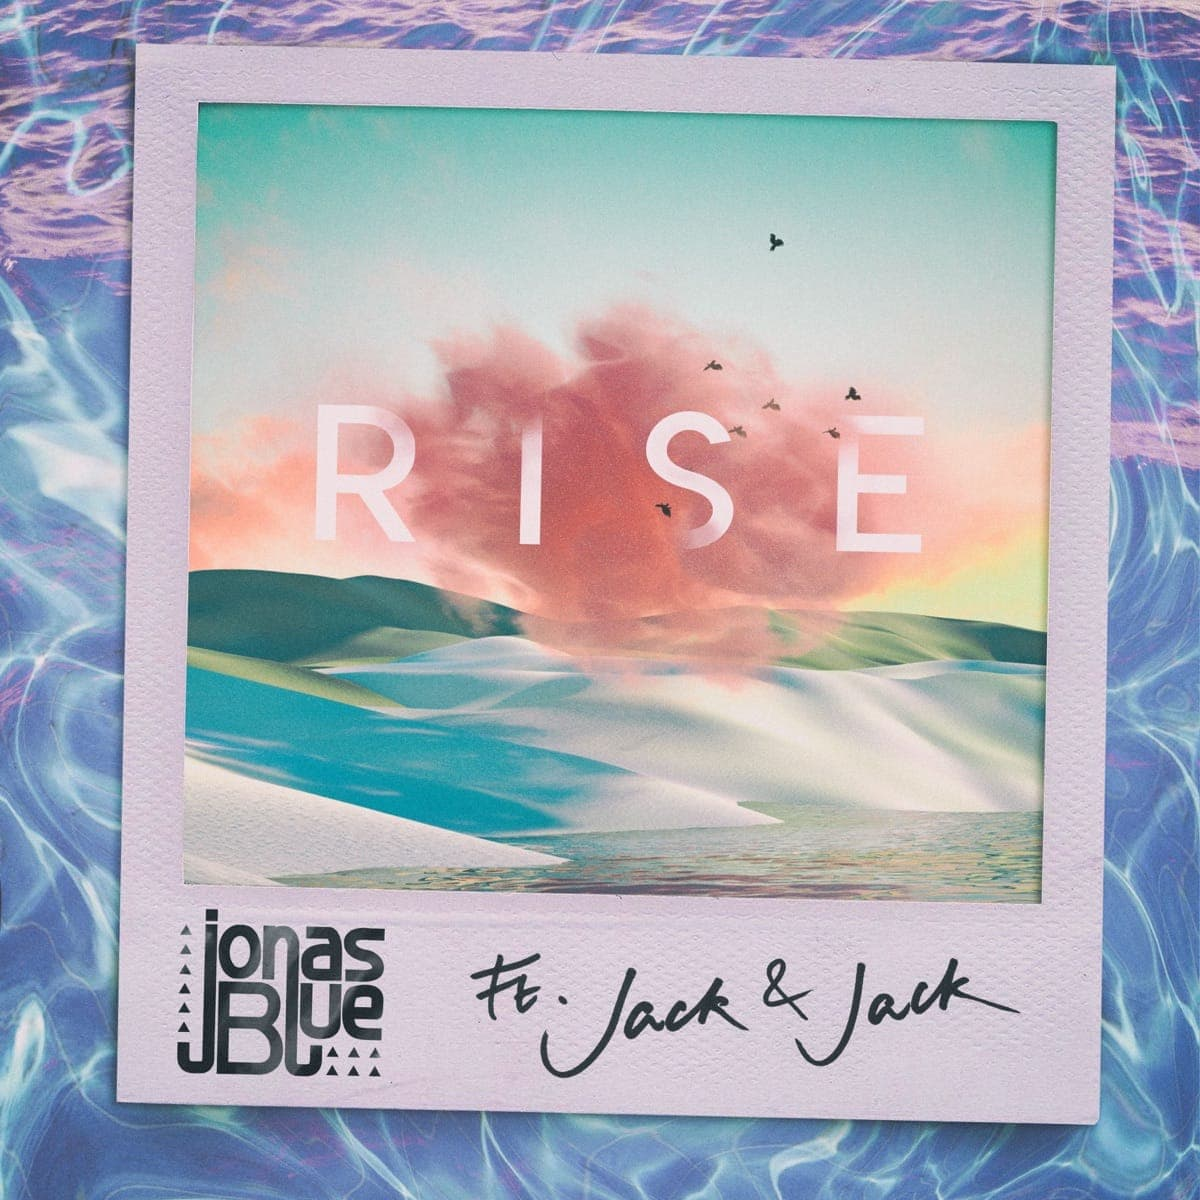 Rise - Jonas Blue